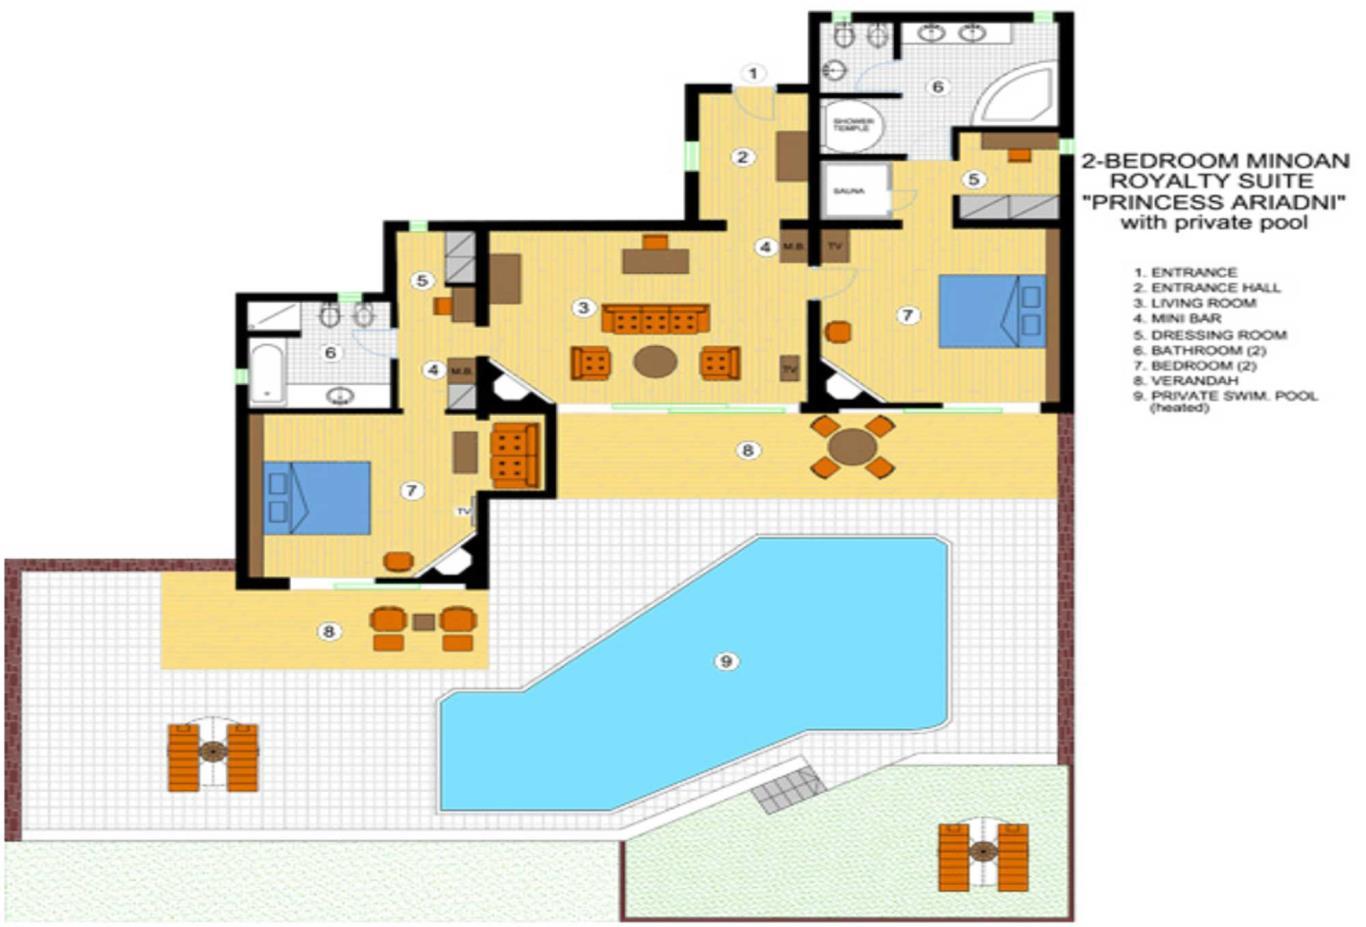 Two Bedroom Princess Ariadni Suite